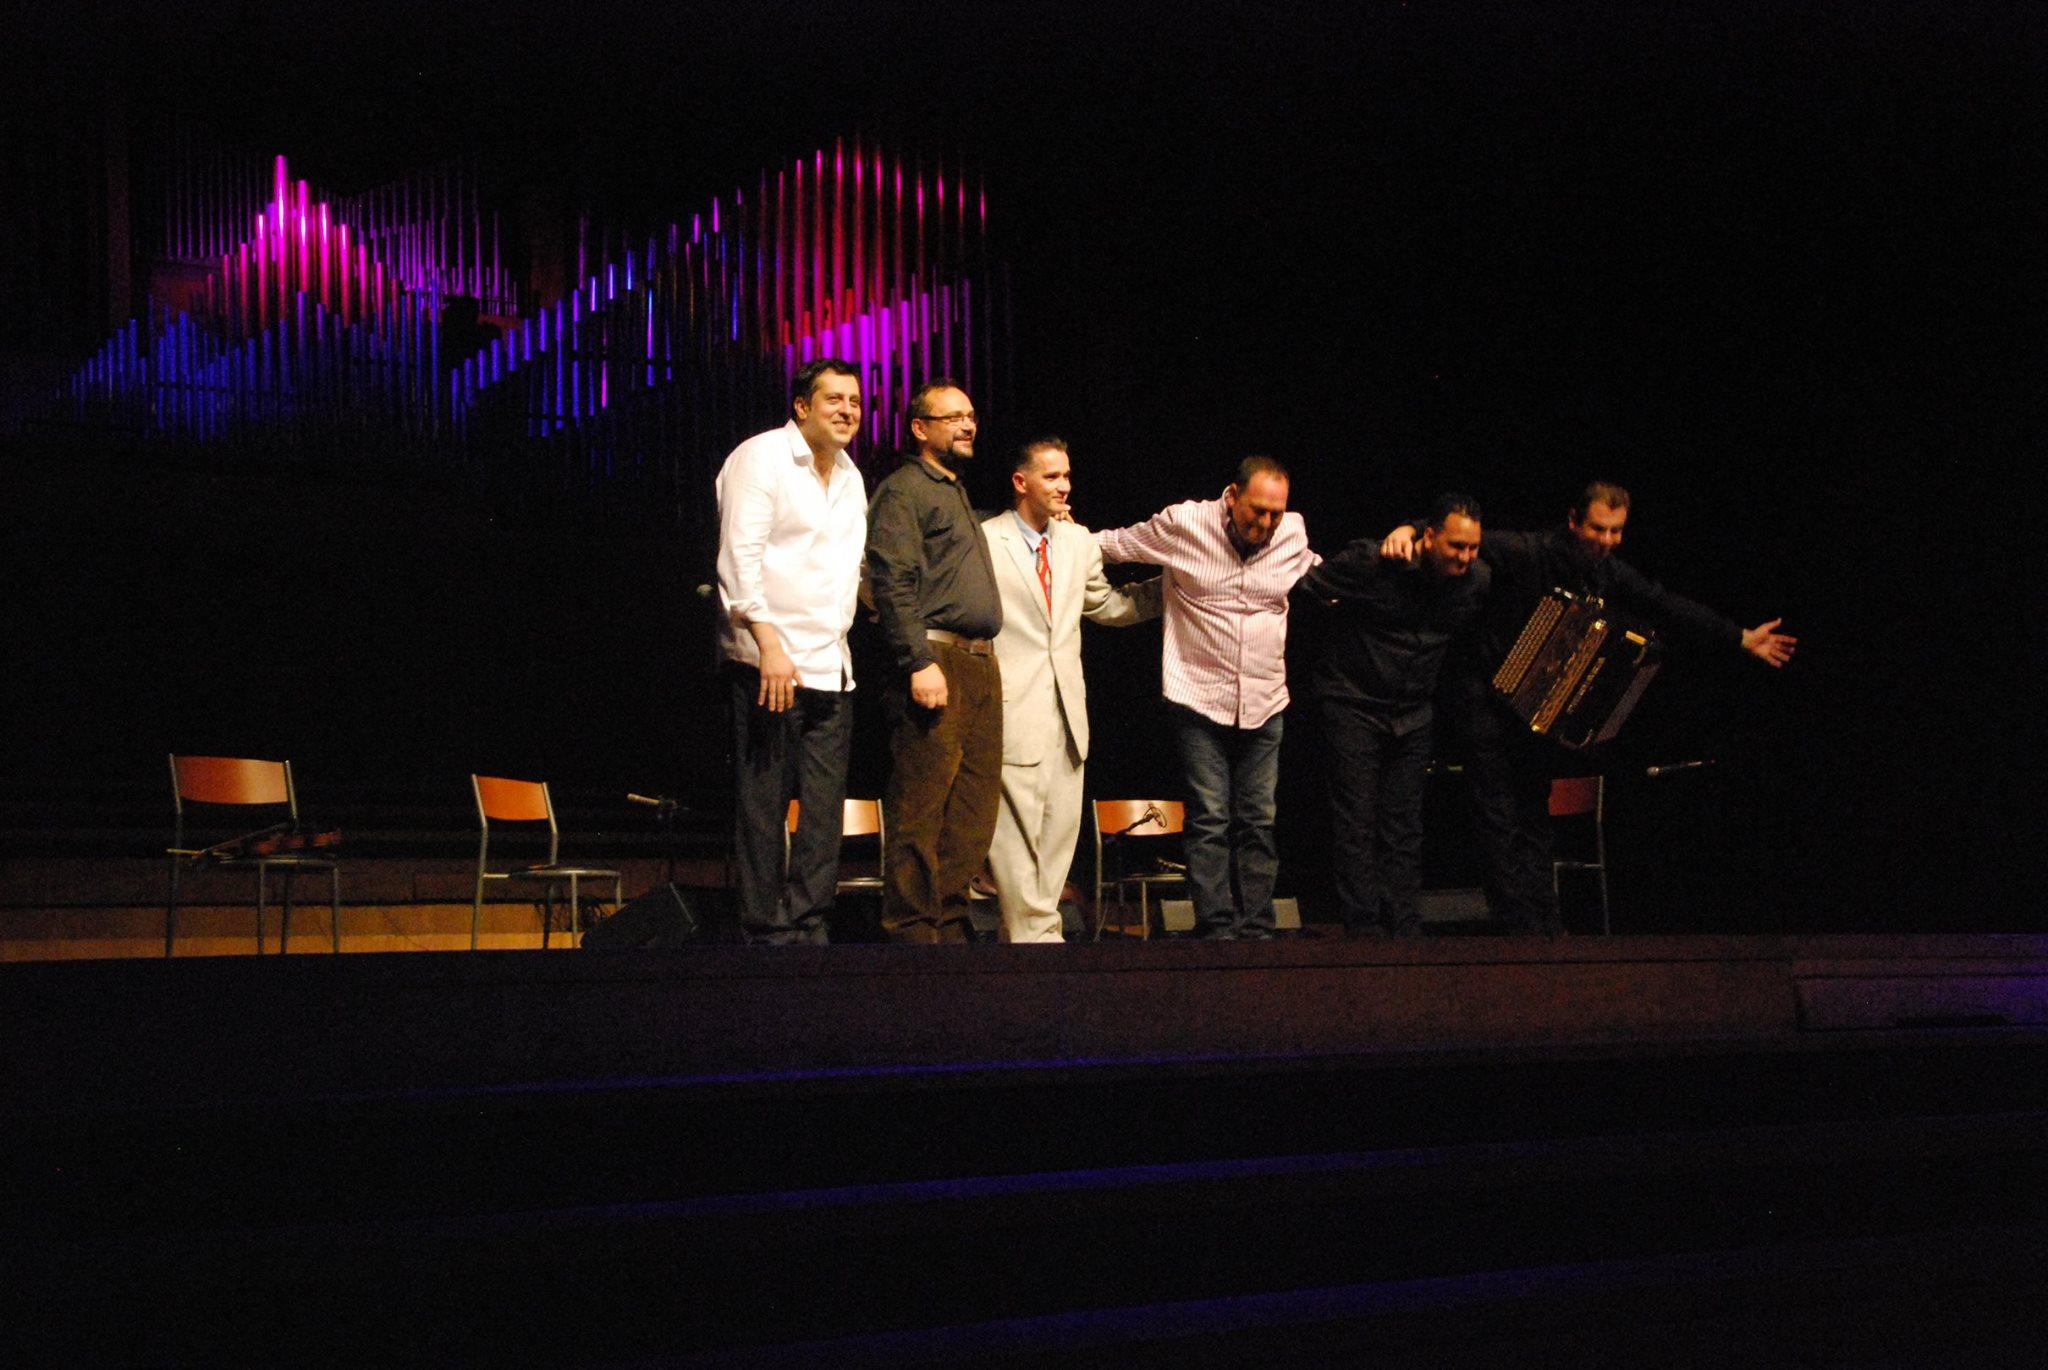 All-Stars-Gypsy-Band-presents-Django-Reinhardt-Legacy-Project_Vatroslav_Lisinski_6